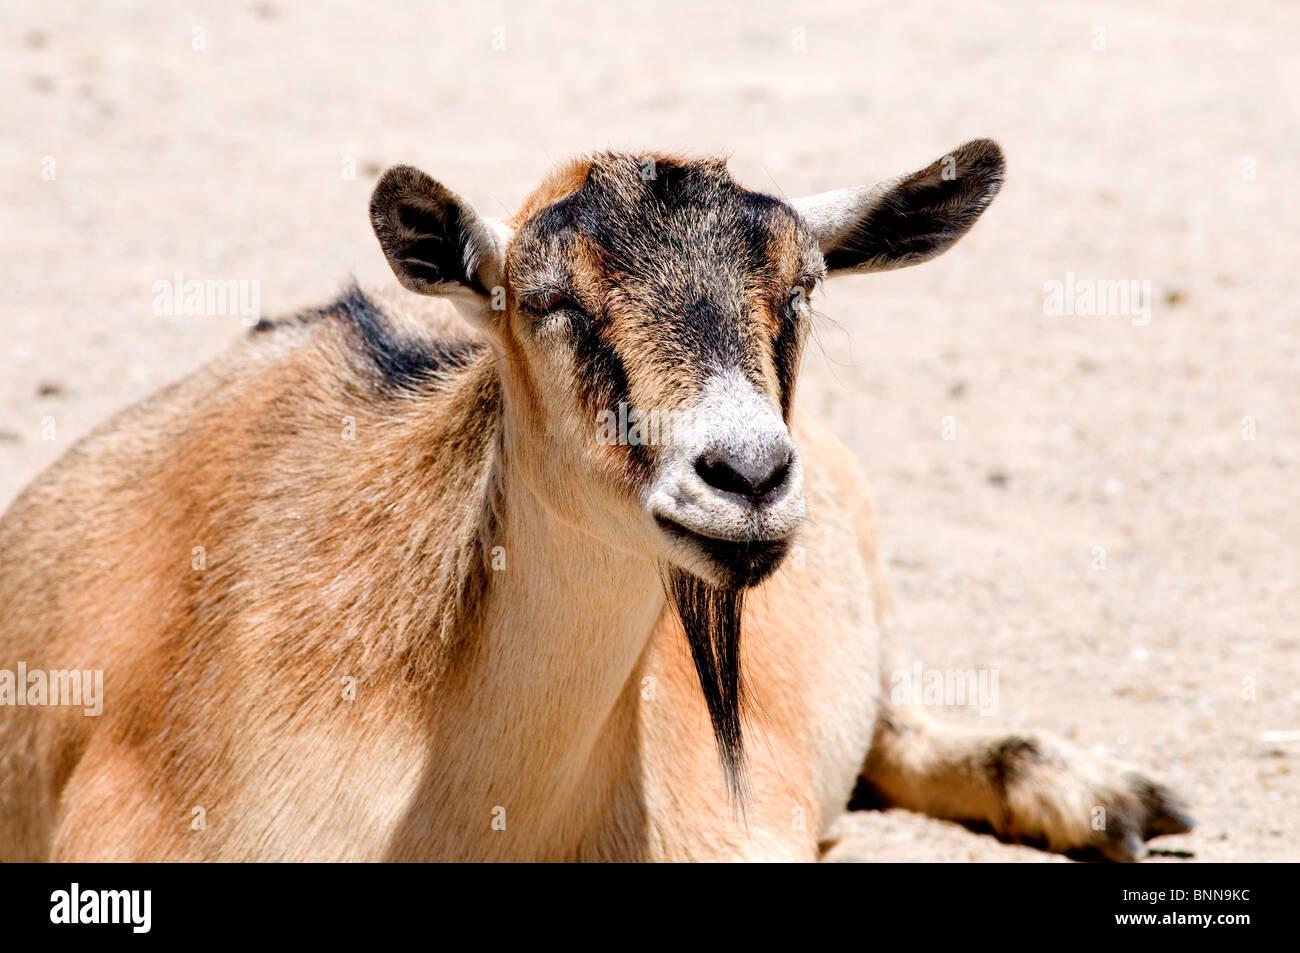 Pygmy goat lying down - Stock Image